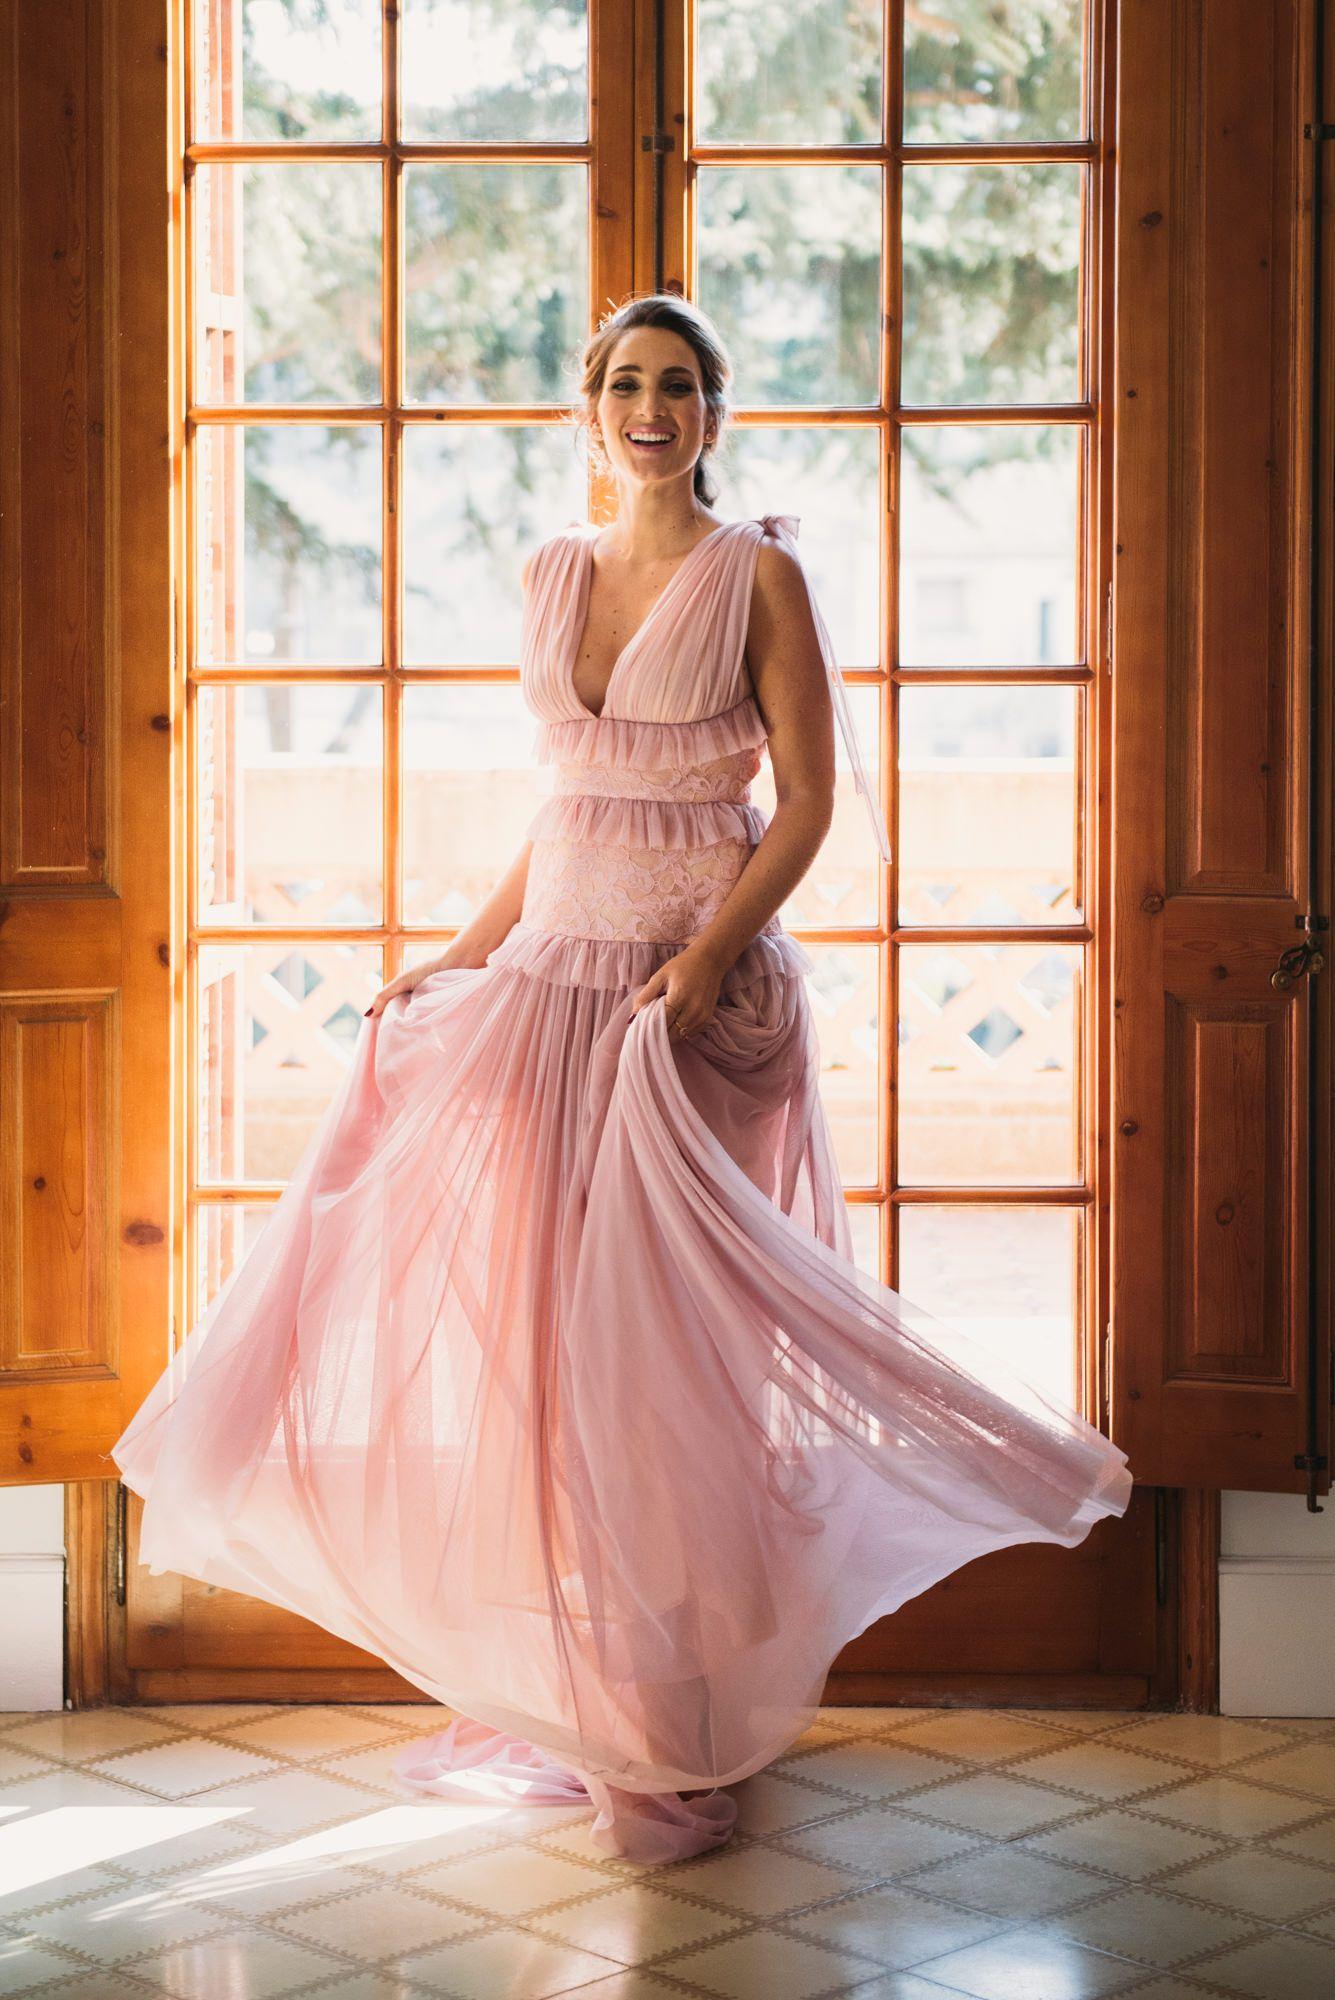 Único Vestido De Novia De Fran Drescher Ornamento - Colección de ...